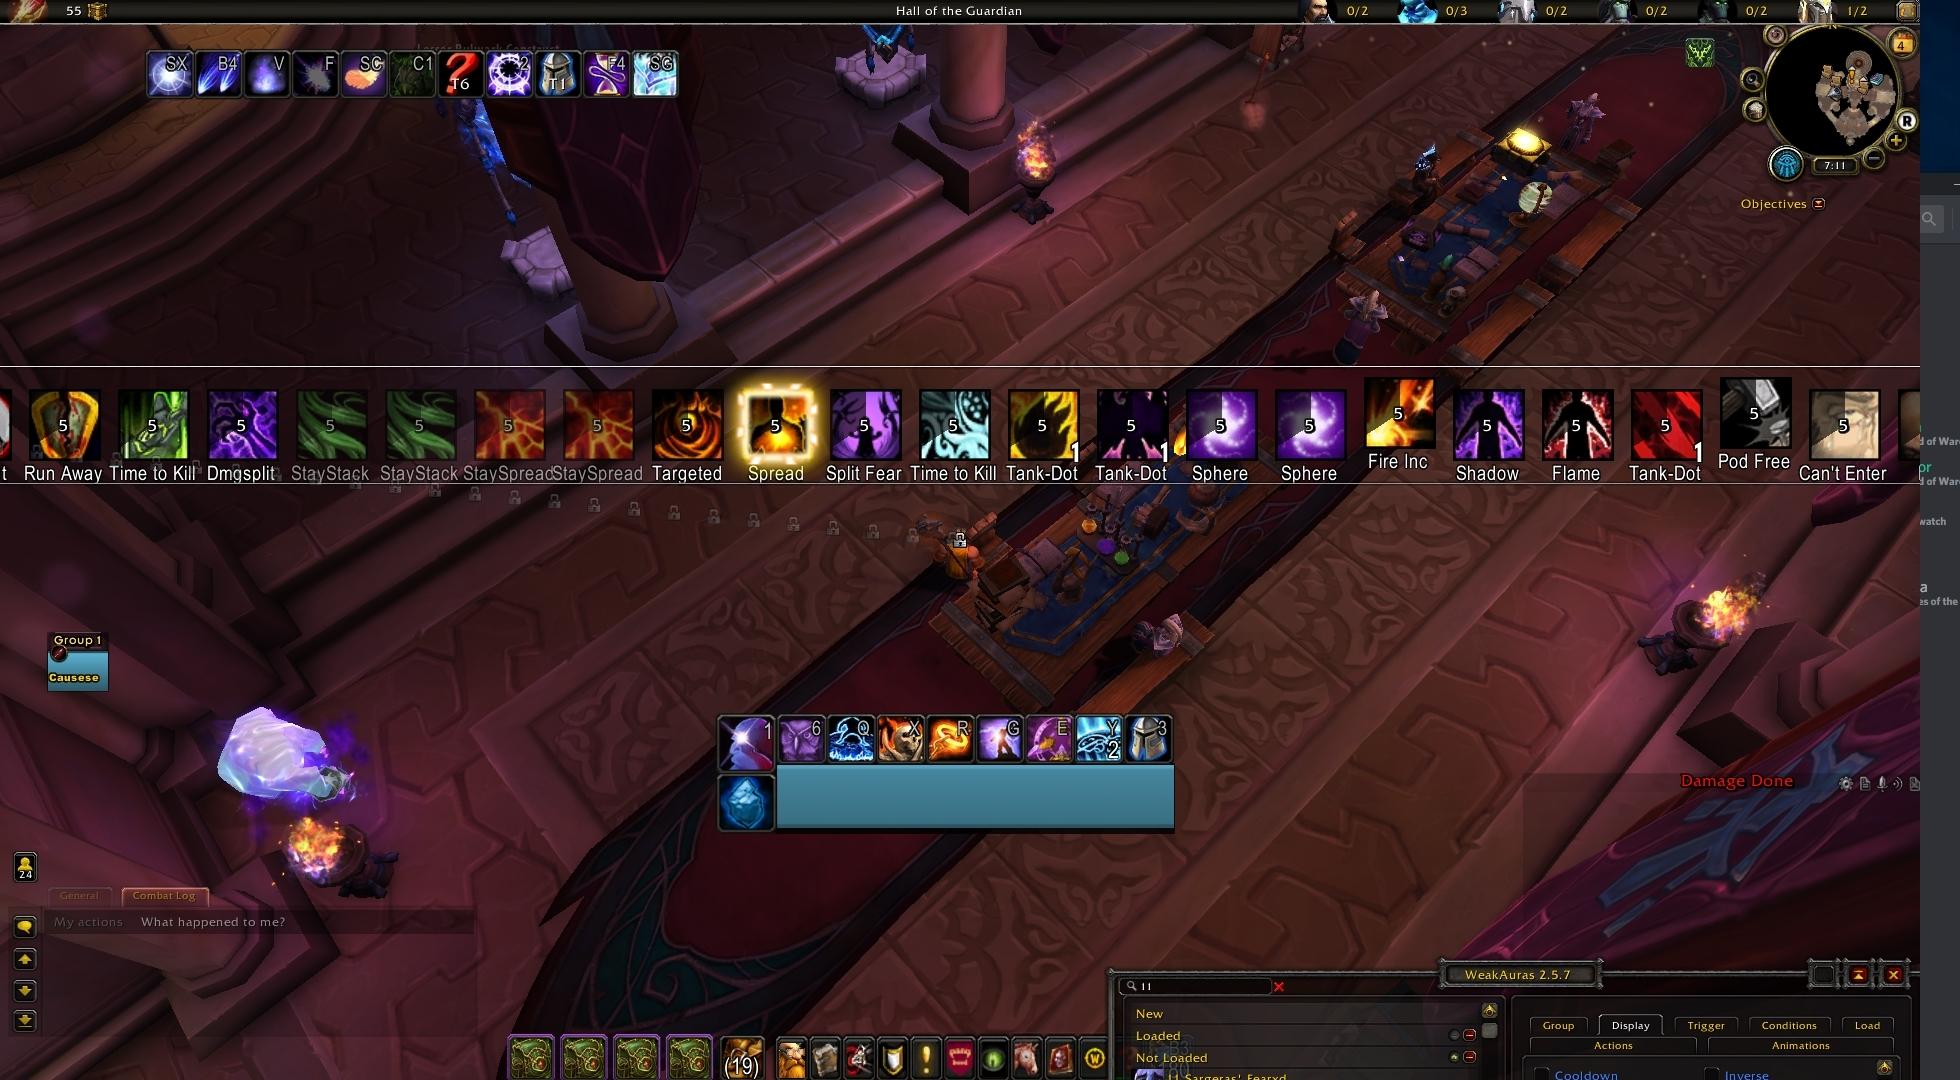 T23 Battle of Dazar'alor Auras (9/9 Bosses, all difficulties, both